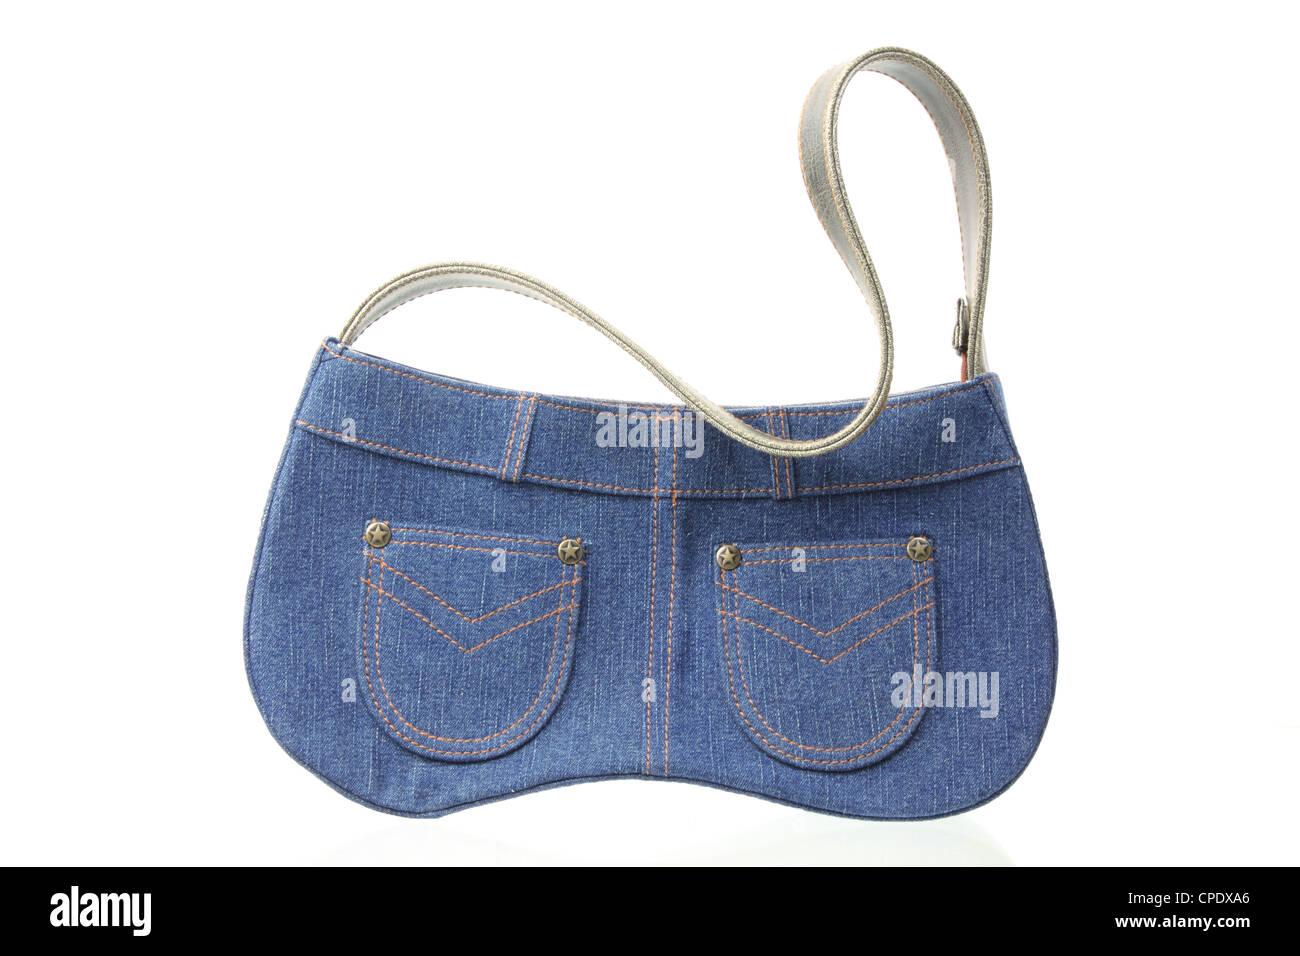 Lady's Denim Handbag - Stock Image